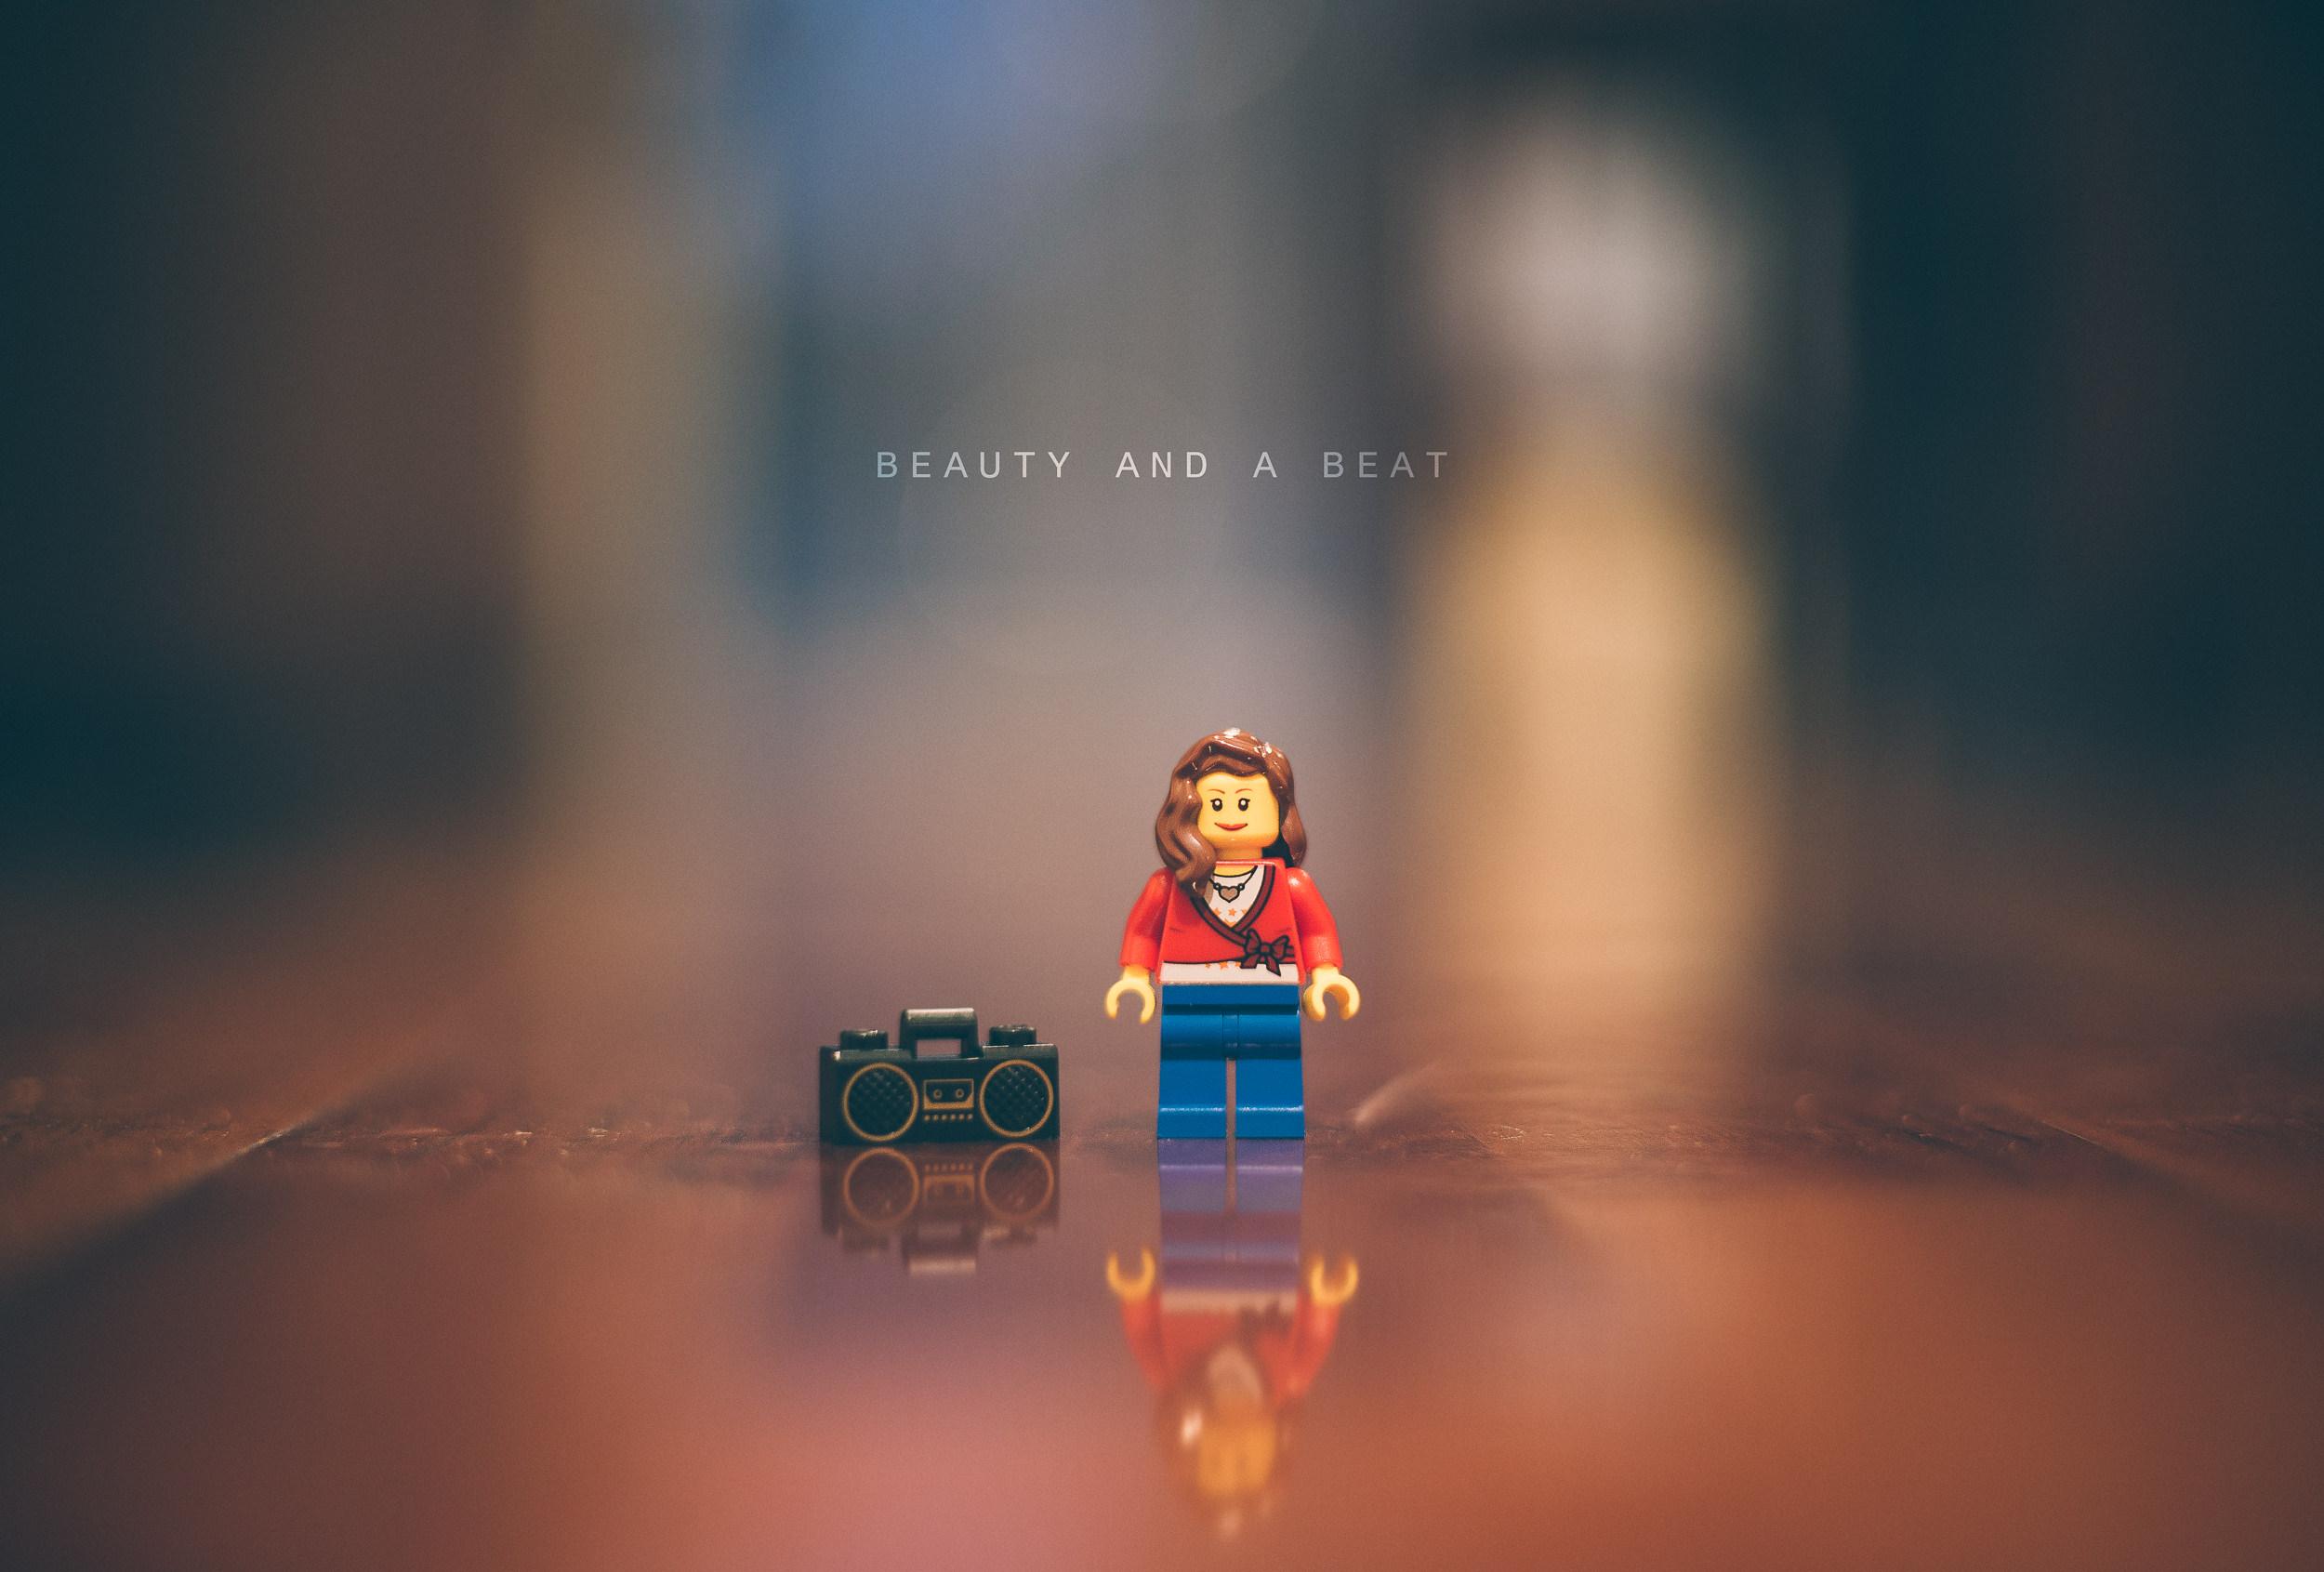 Lego-Portrait-Series-Reggie-Ballesteros-0002.jpg